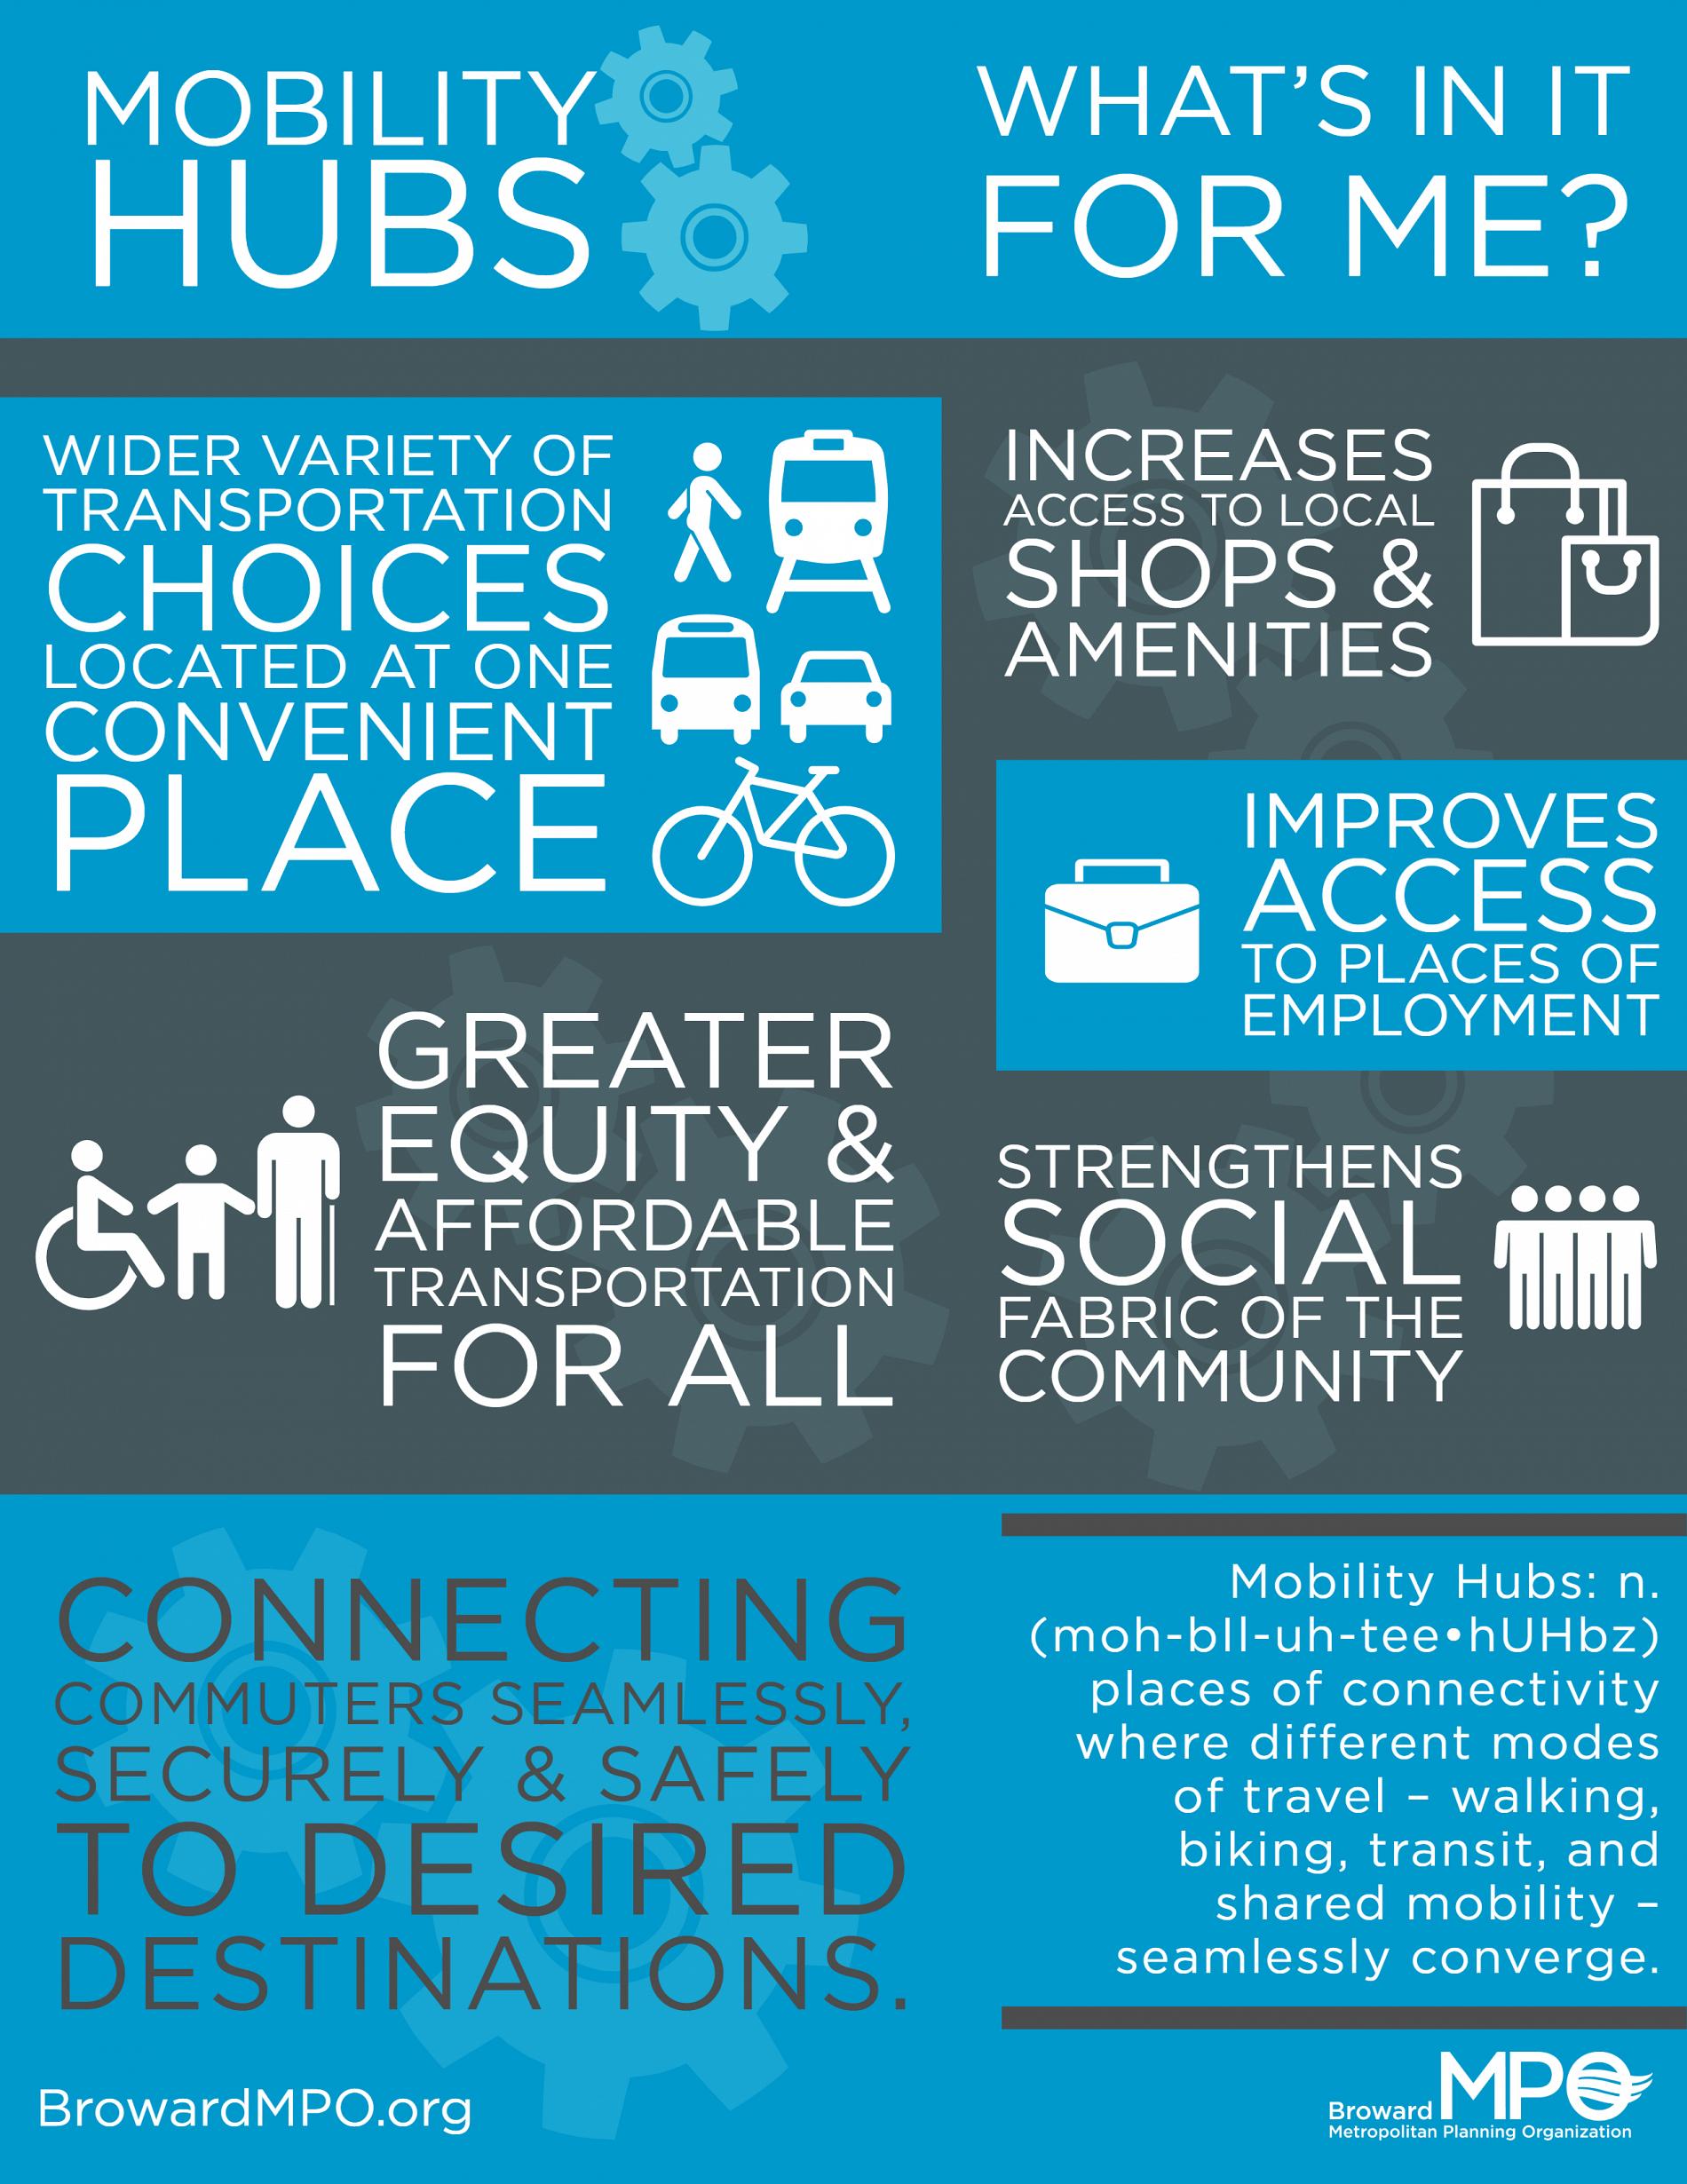 20190903 Mobility Hubs Fact Sheet